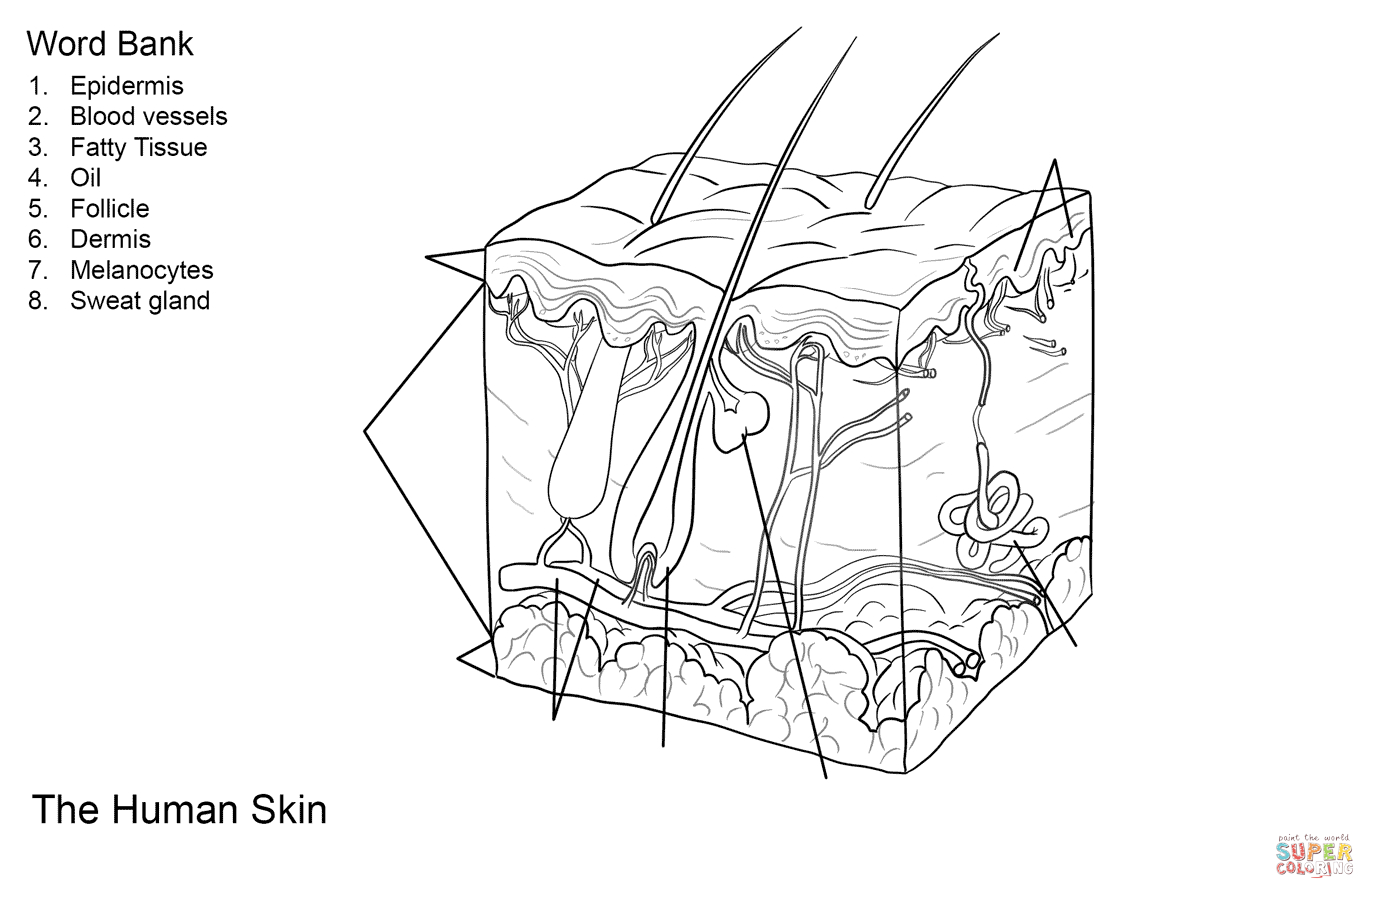 Human Skin Anatomy Worksheet Coloring Page | Free Printable Coloring - Free Printable Anatomy Pictures